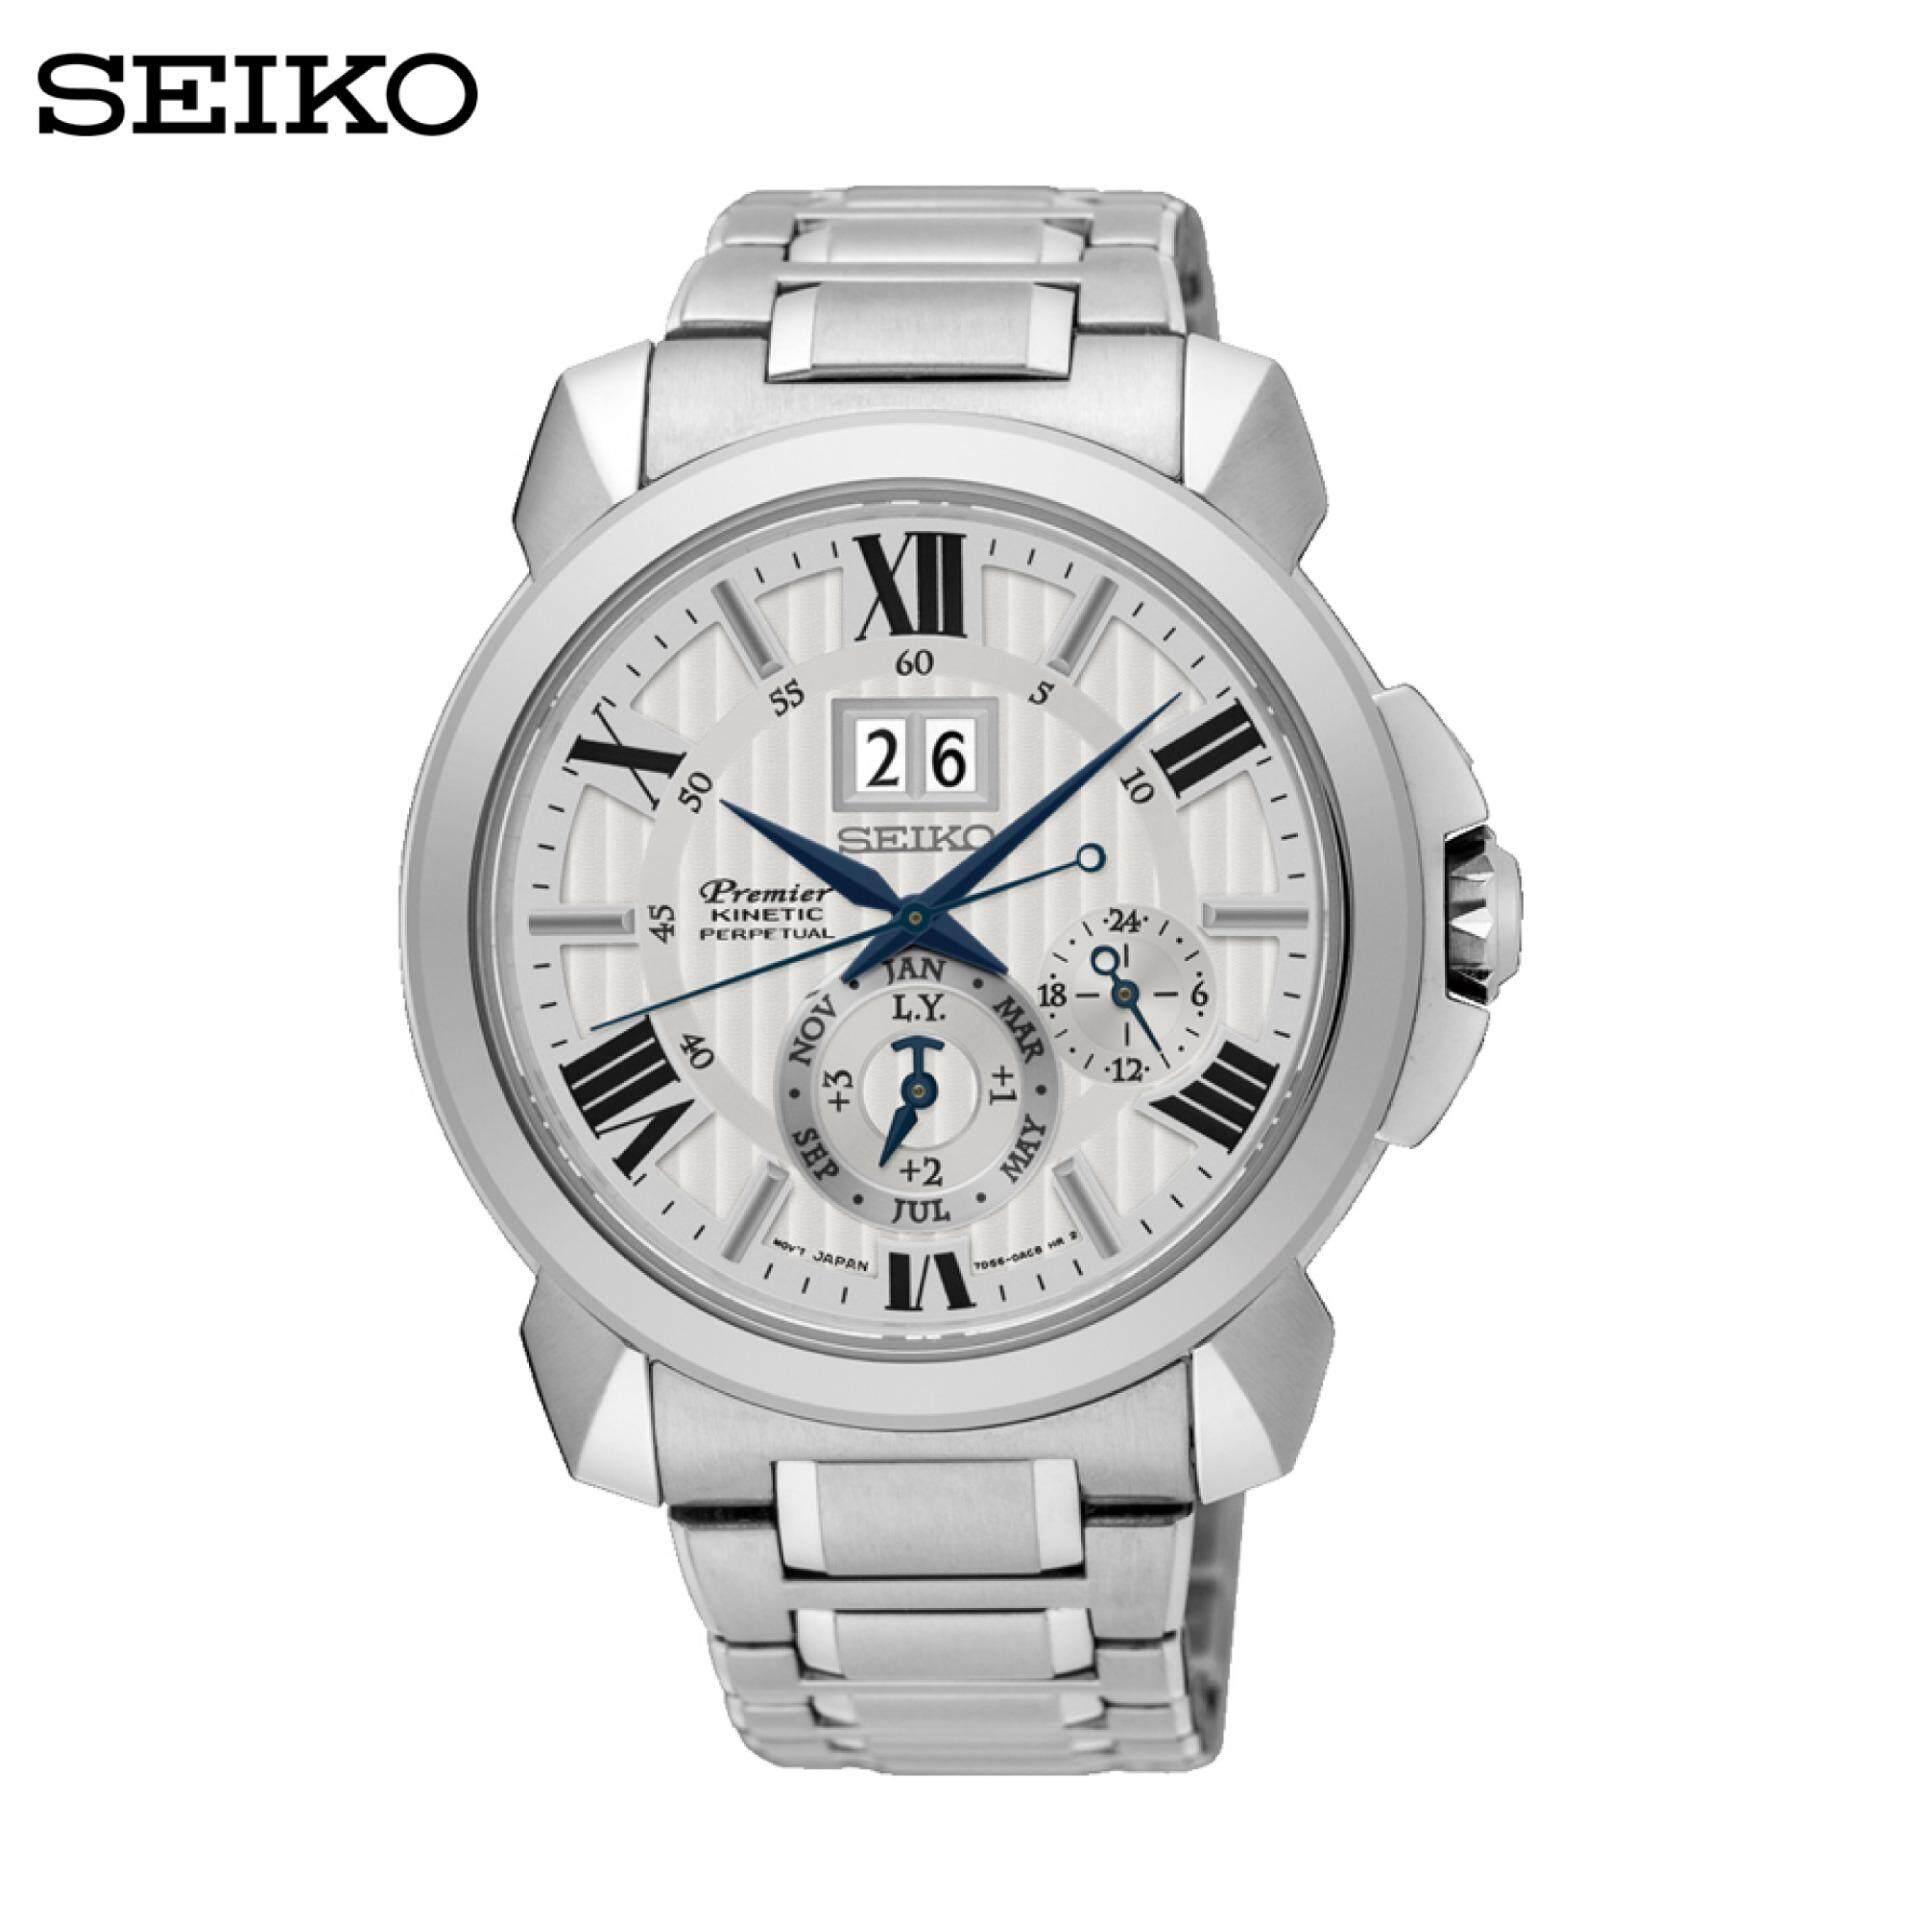 Sell Seiko Kinetic Ska619p1 Cheapest Best Quality Th Store Ska683p1 Silver Dial Stainless Steel Bracelet Thb 25075 Premier Snp139pthb25075